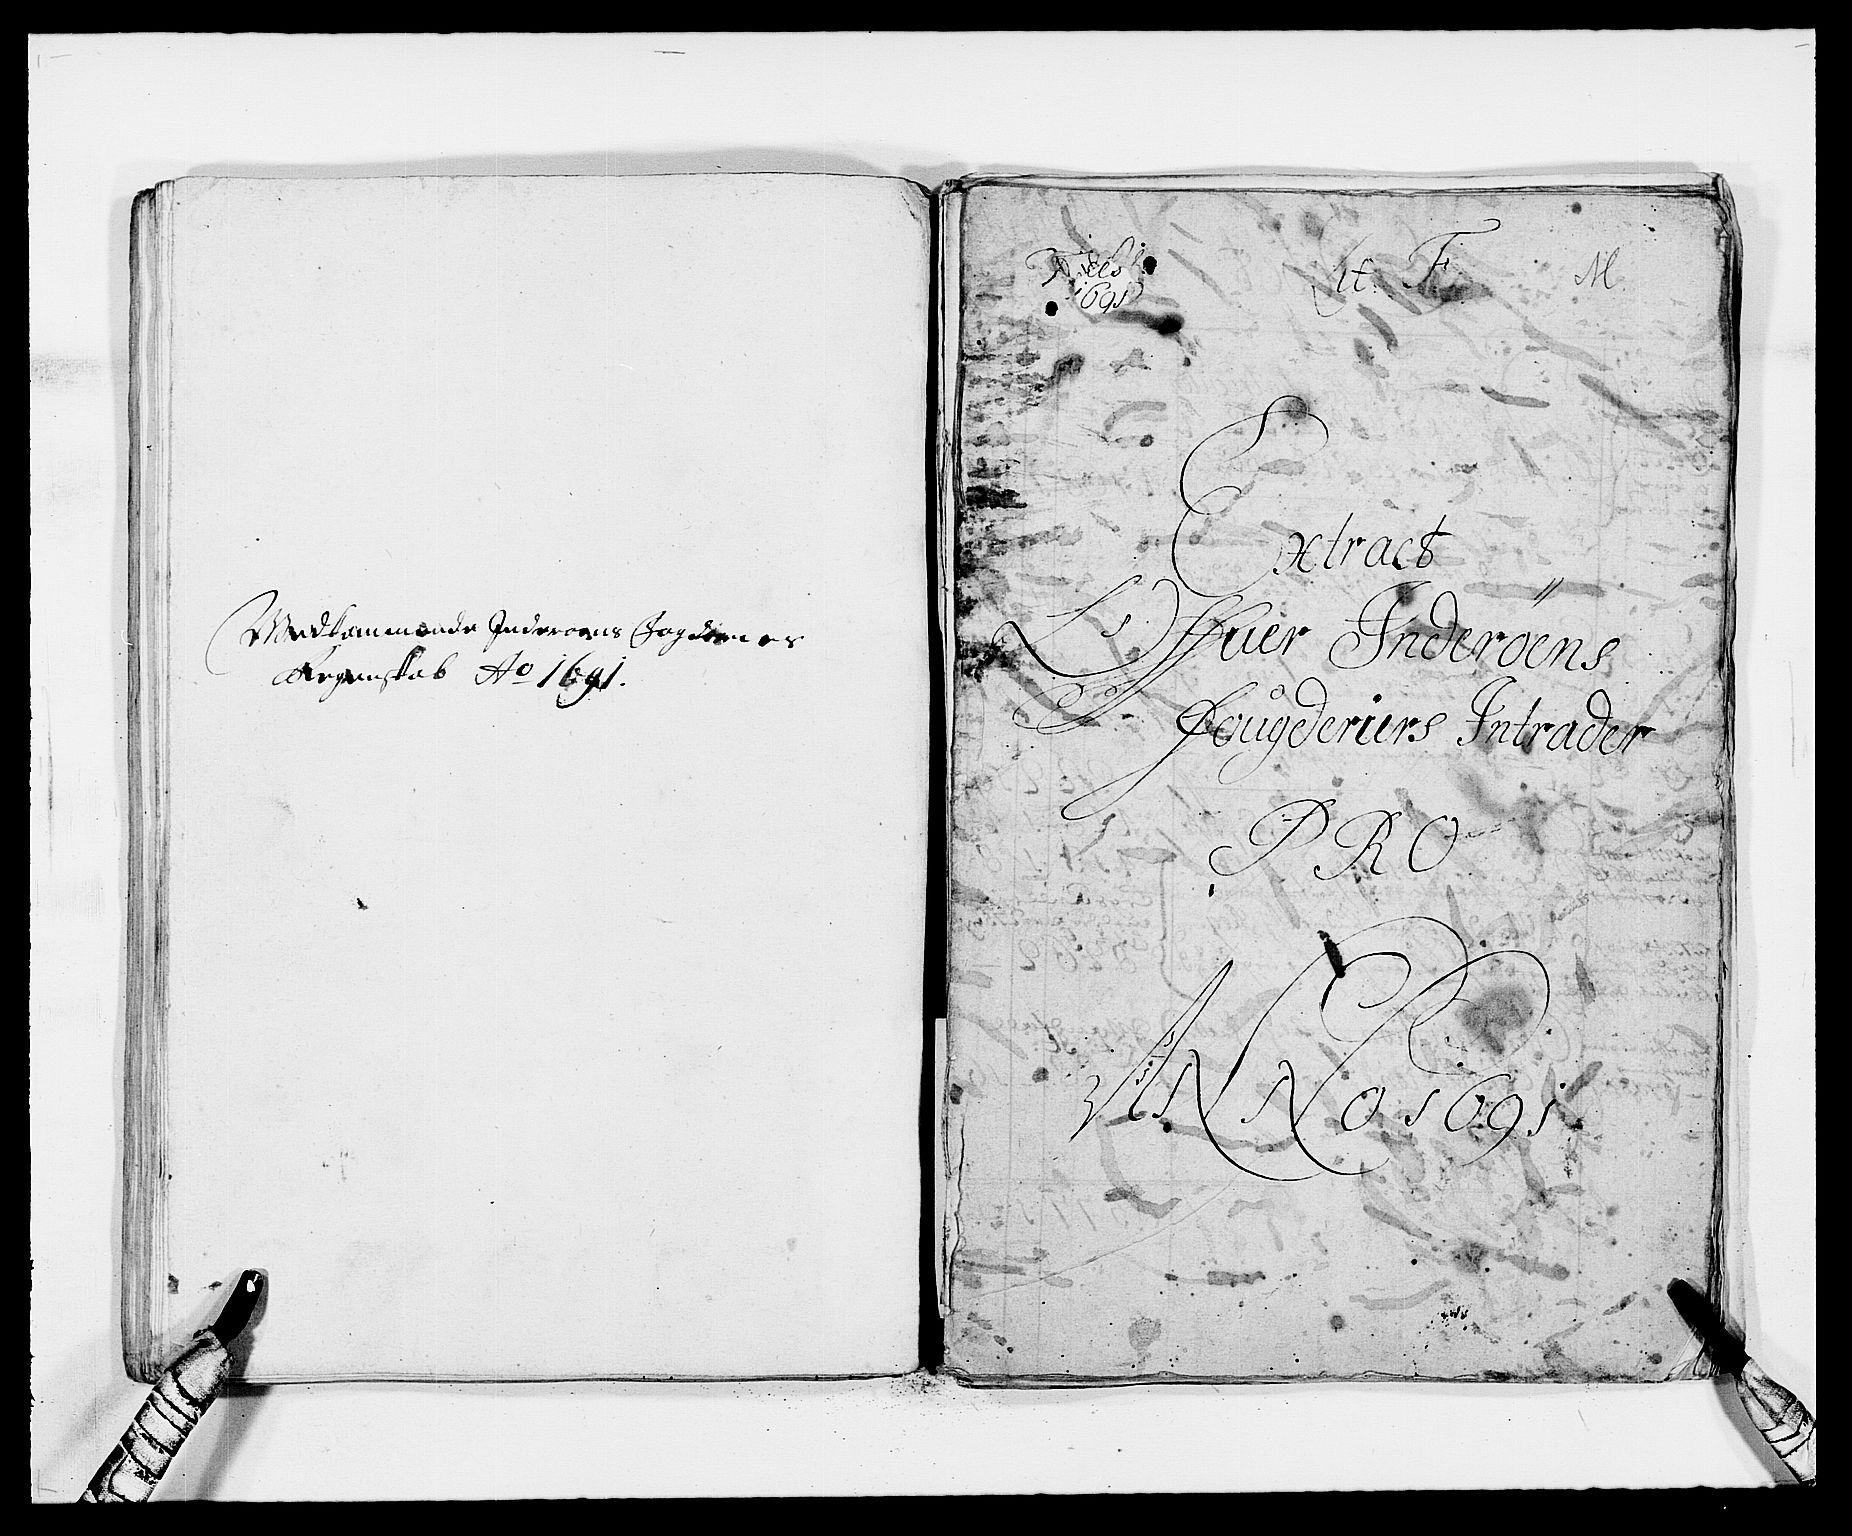 RA, Rentekammeret inntil 1814, Reviderte regnskaper, Fogderegnskap, R63/L4307: Fogderegnskap Inderøy, 1690-1691, s. 225